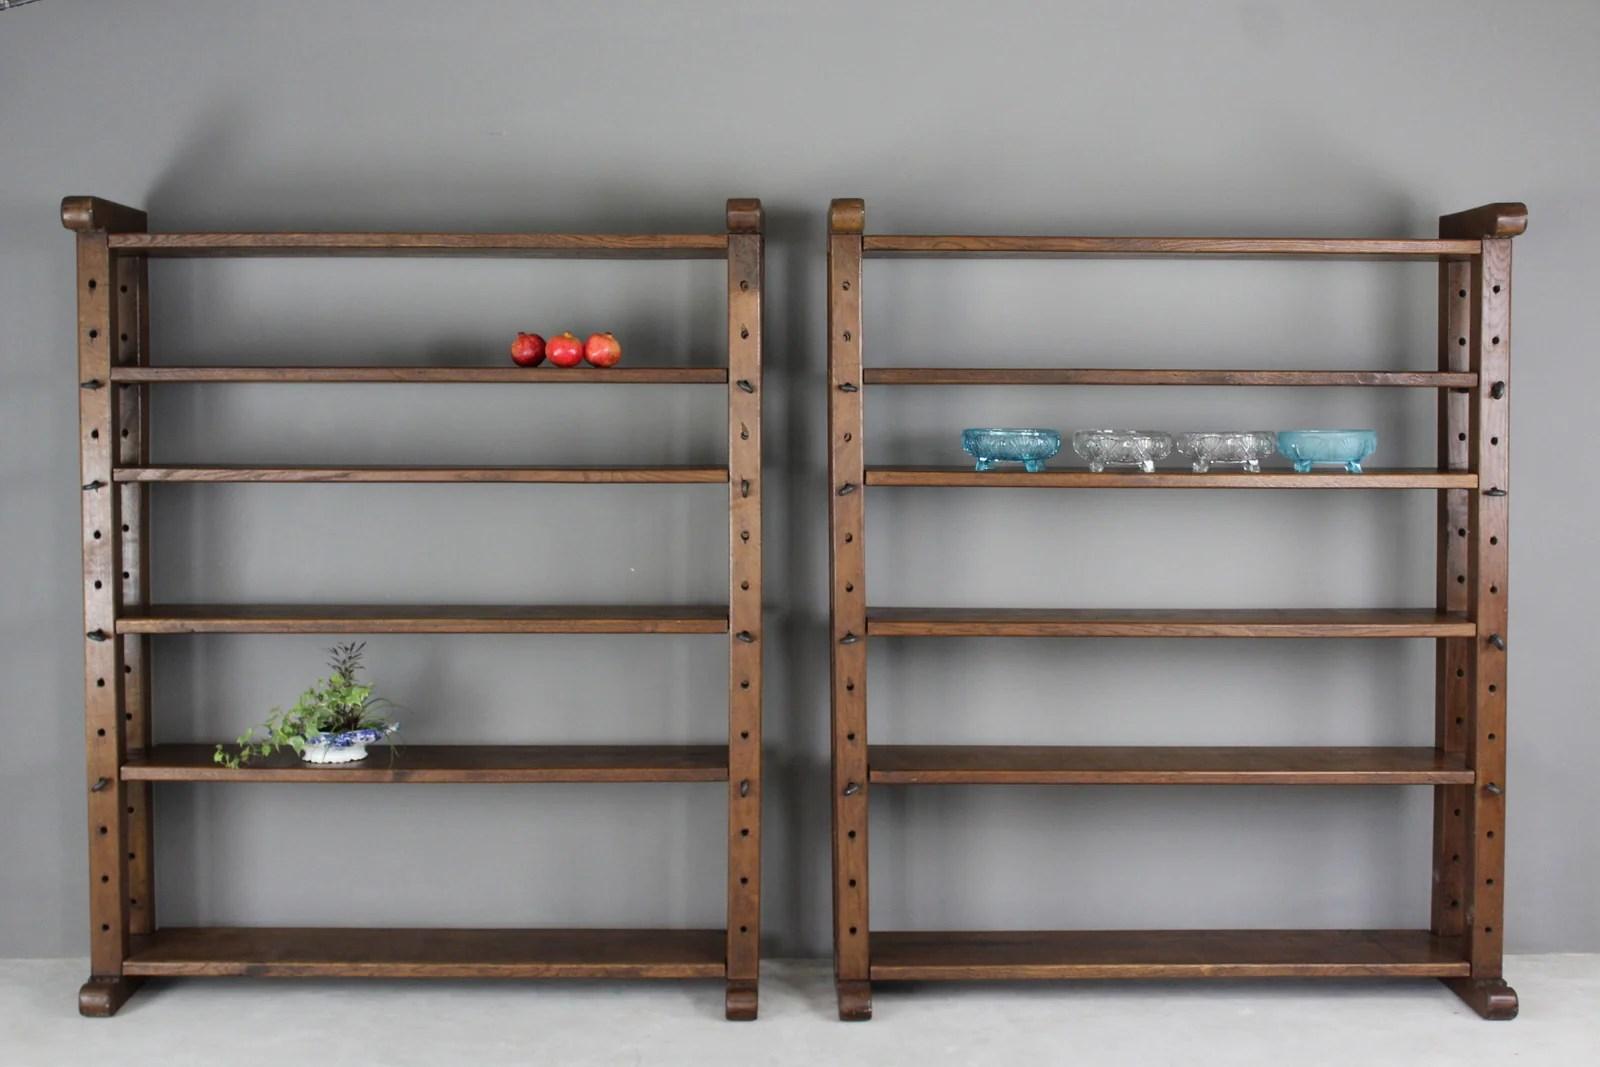 Large Oak Bookcase Shelves